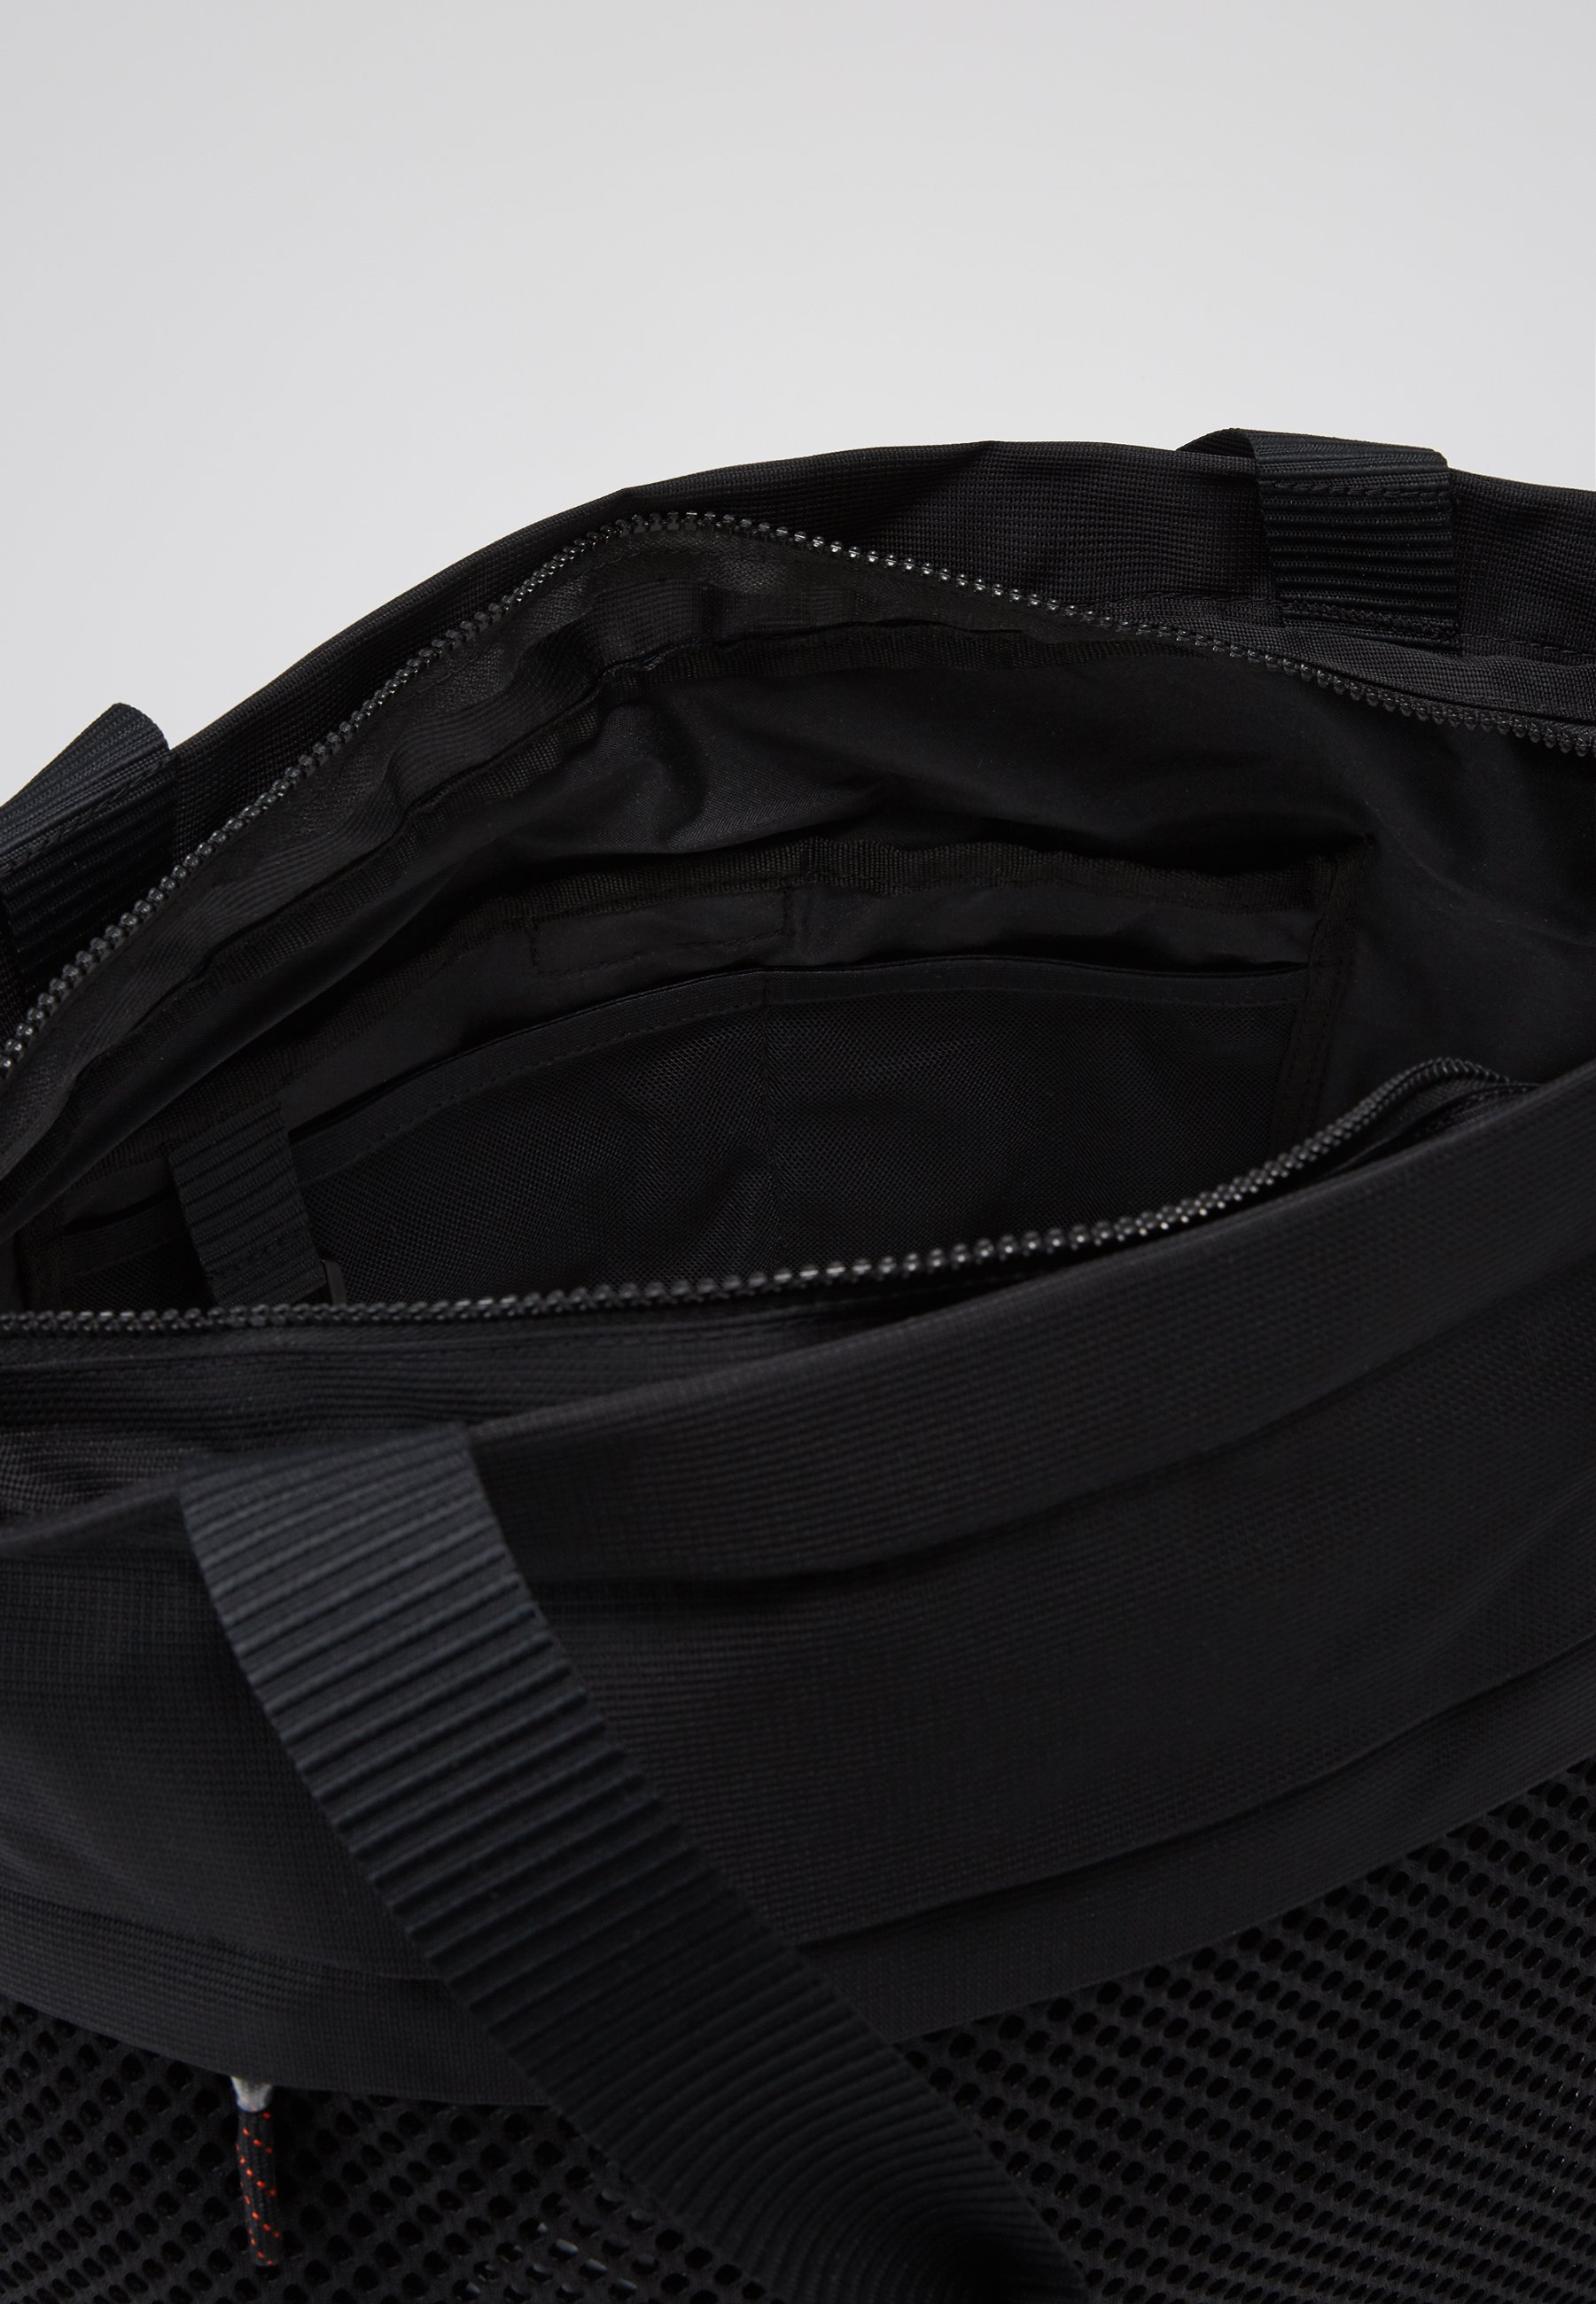 Nike Sportswear ESSENTIALS - Shoppingveske - black/white/svart 81TyGlLfAV9a0lu